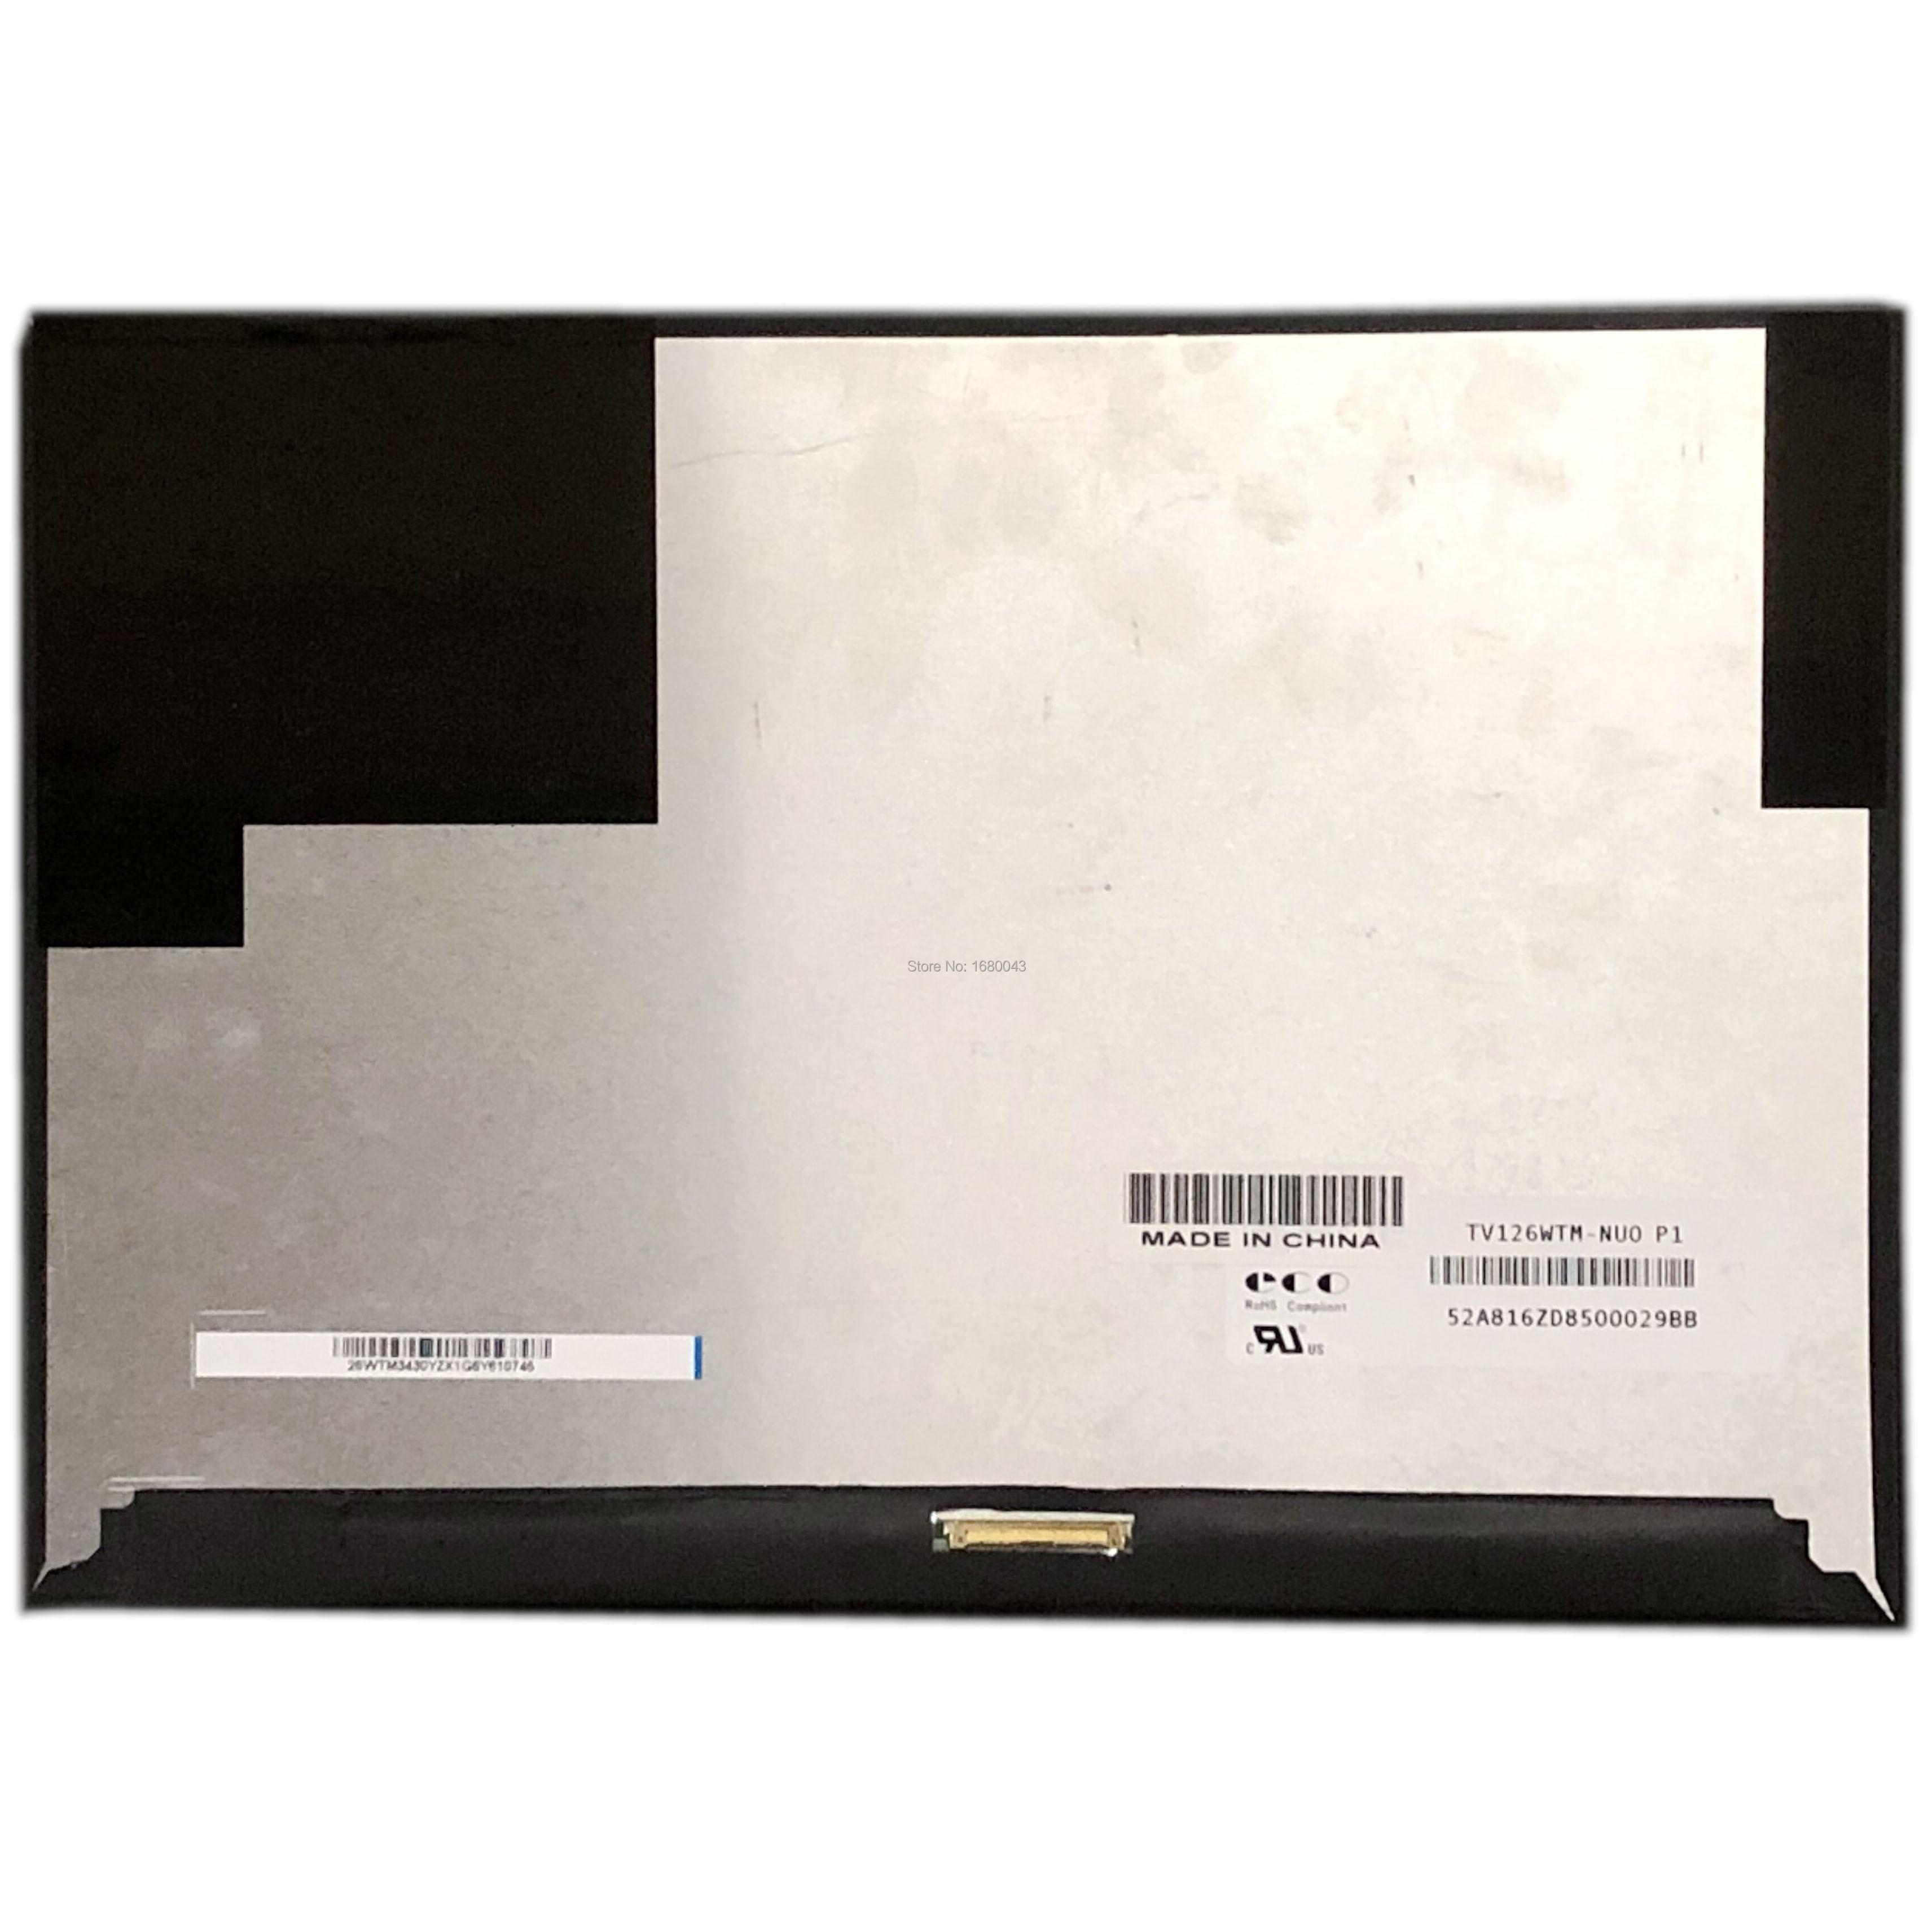 TV126WTM-NU0 P1 12,6 2160X1440 LCD SCREEN PANEL Matrix Ersatz